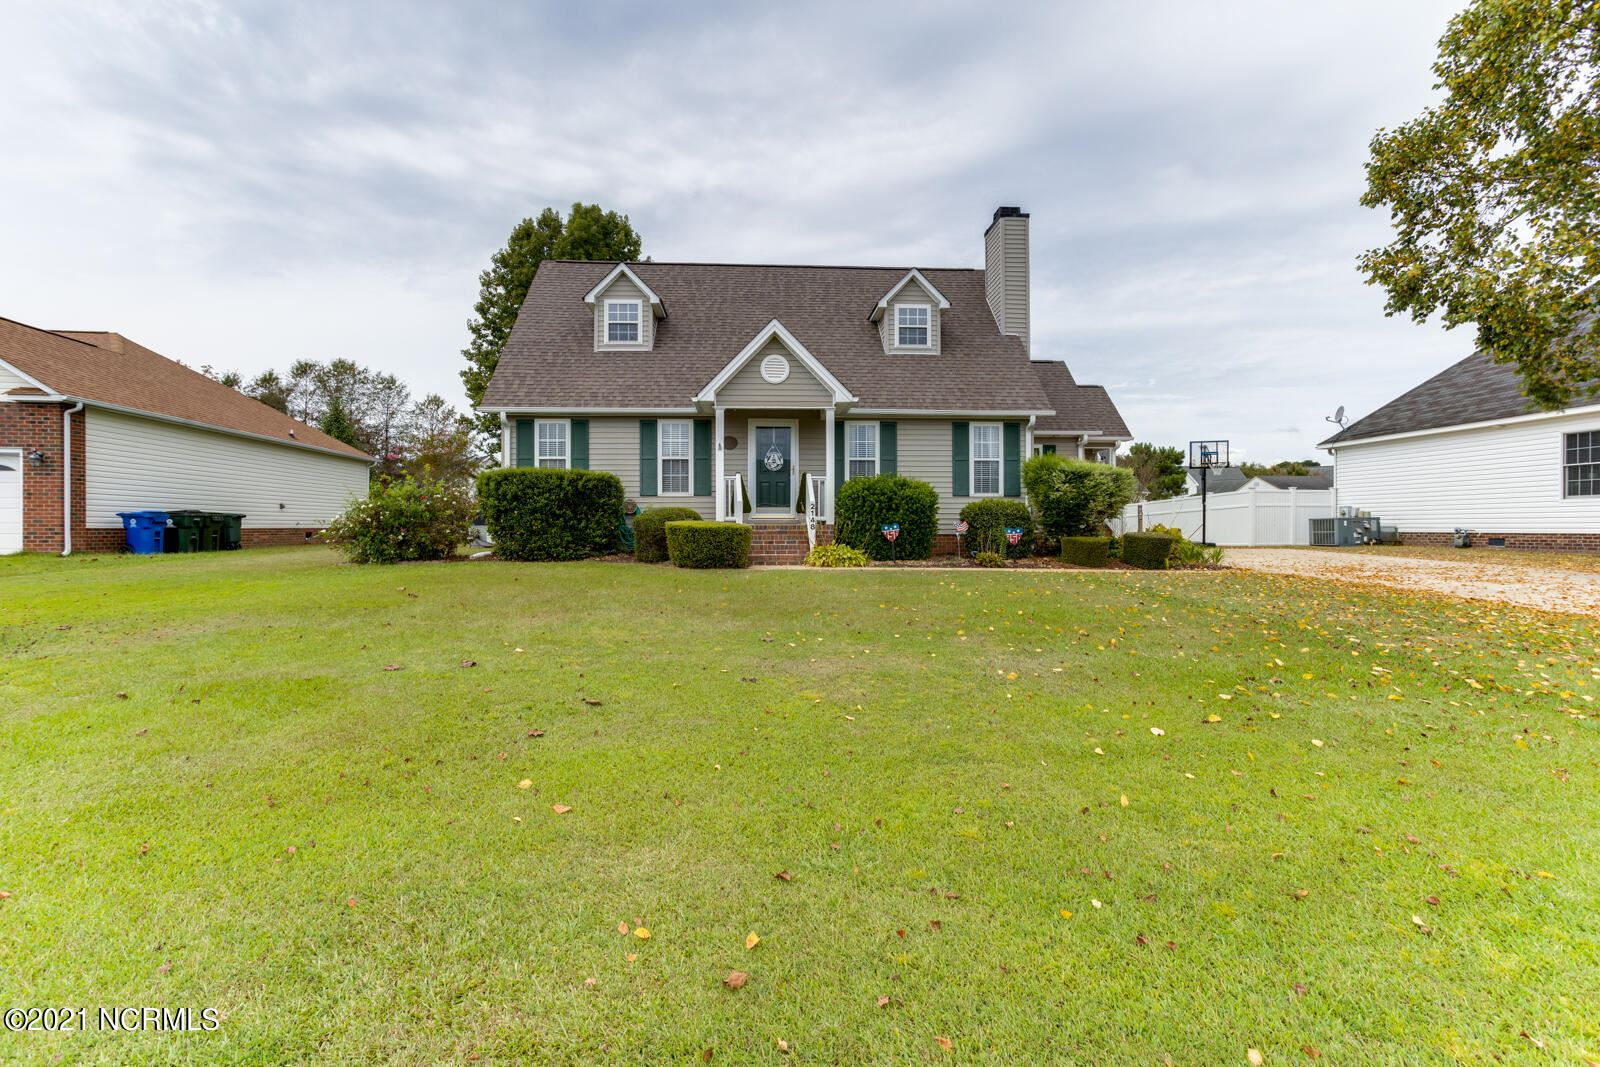 Photo of 2148 Winder Drive, Winterville, NC 28590 (MLS # 100291072)